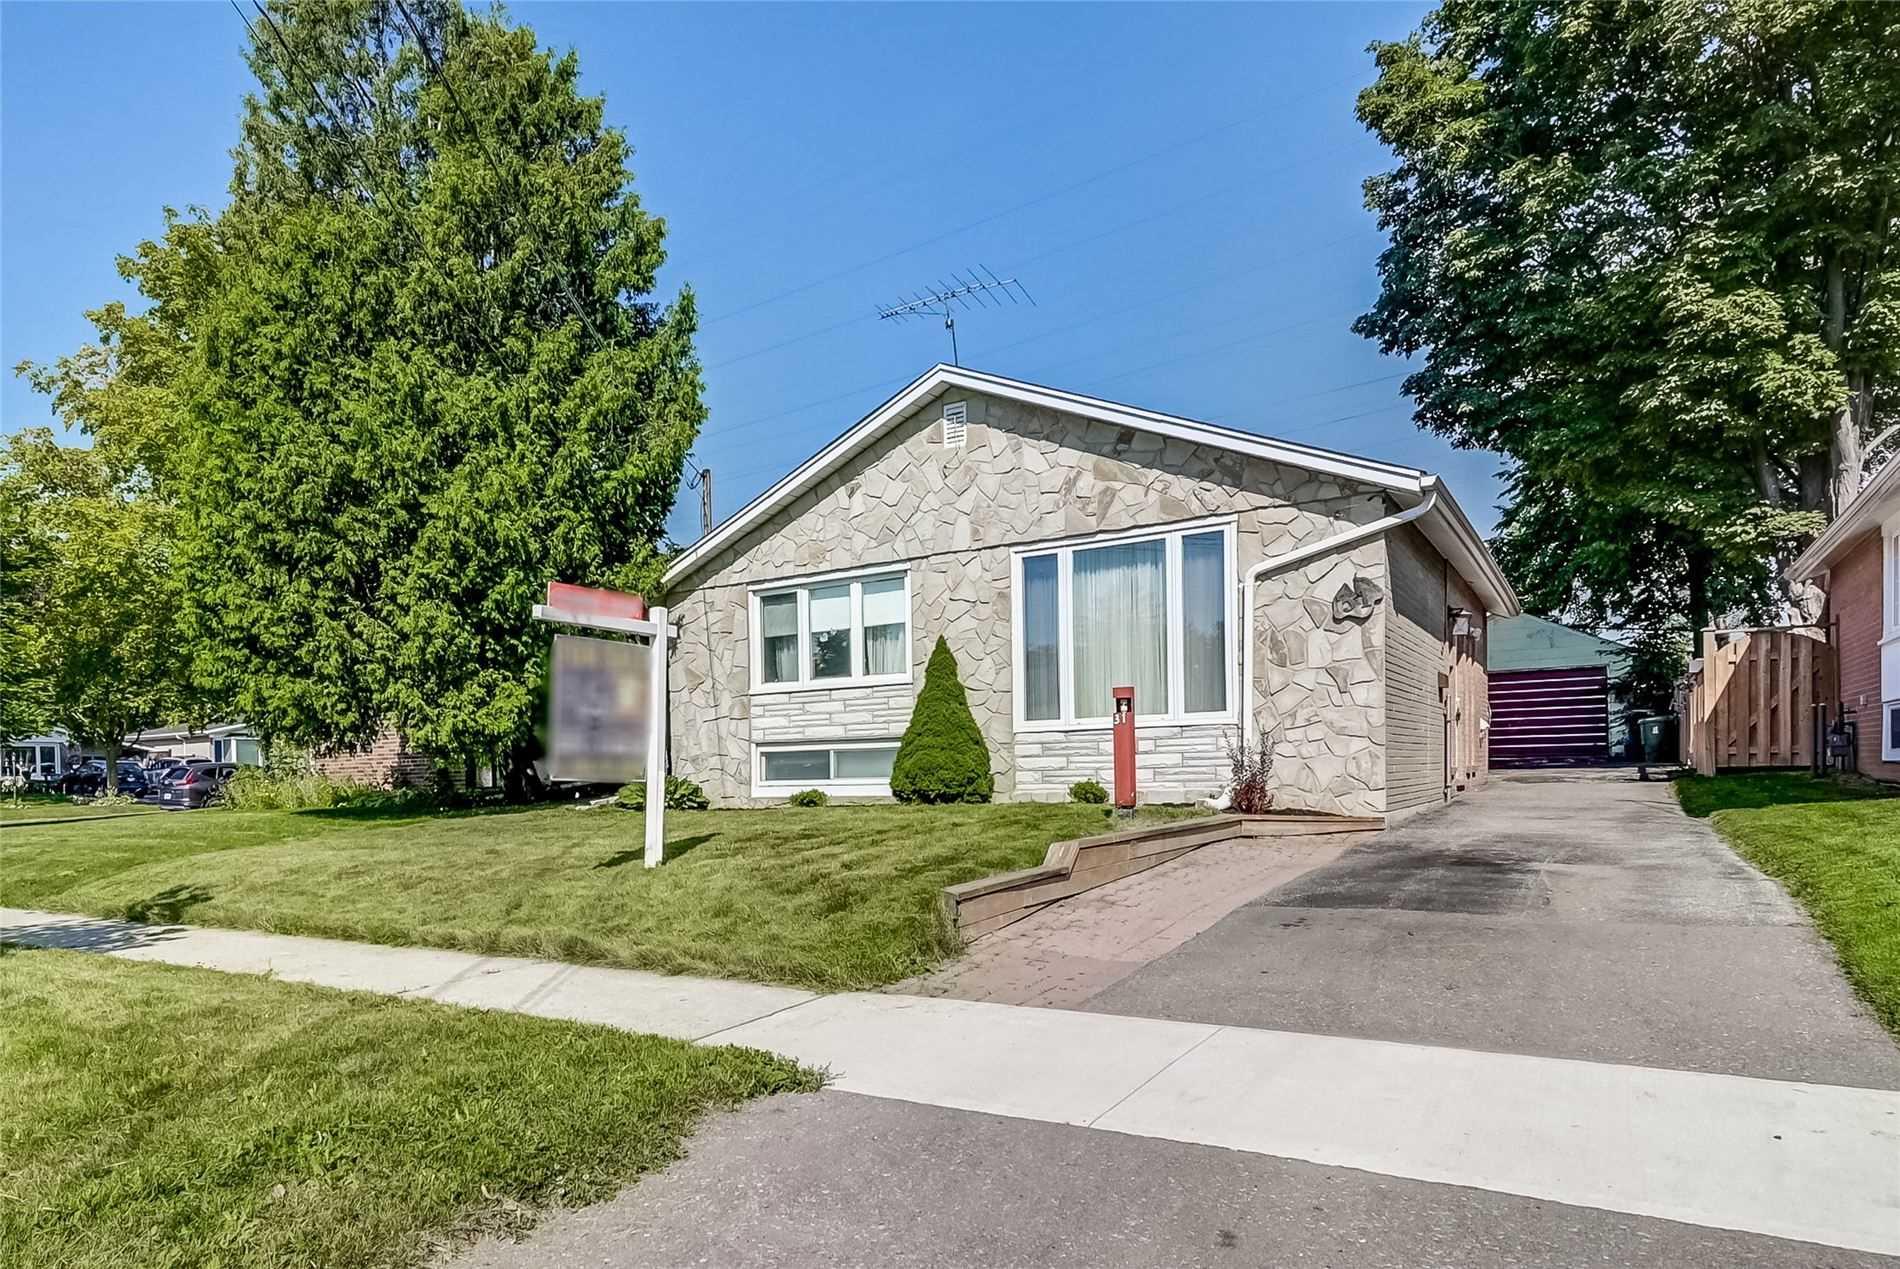 Detached house For Sale In Toronto - 31 Ben Nevis Dr, Toronto, Ontario, Canada M1H1M8 , 3 Bedrooms Bedrooms, ,2 BathroomsBathrooms,Detached,For Sale,Ben Nevis